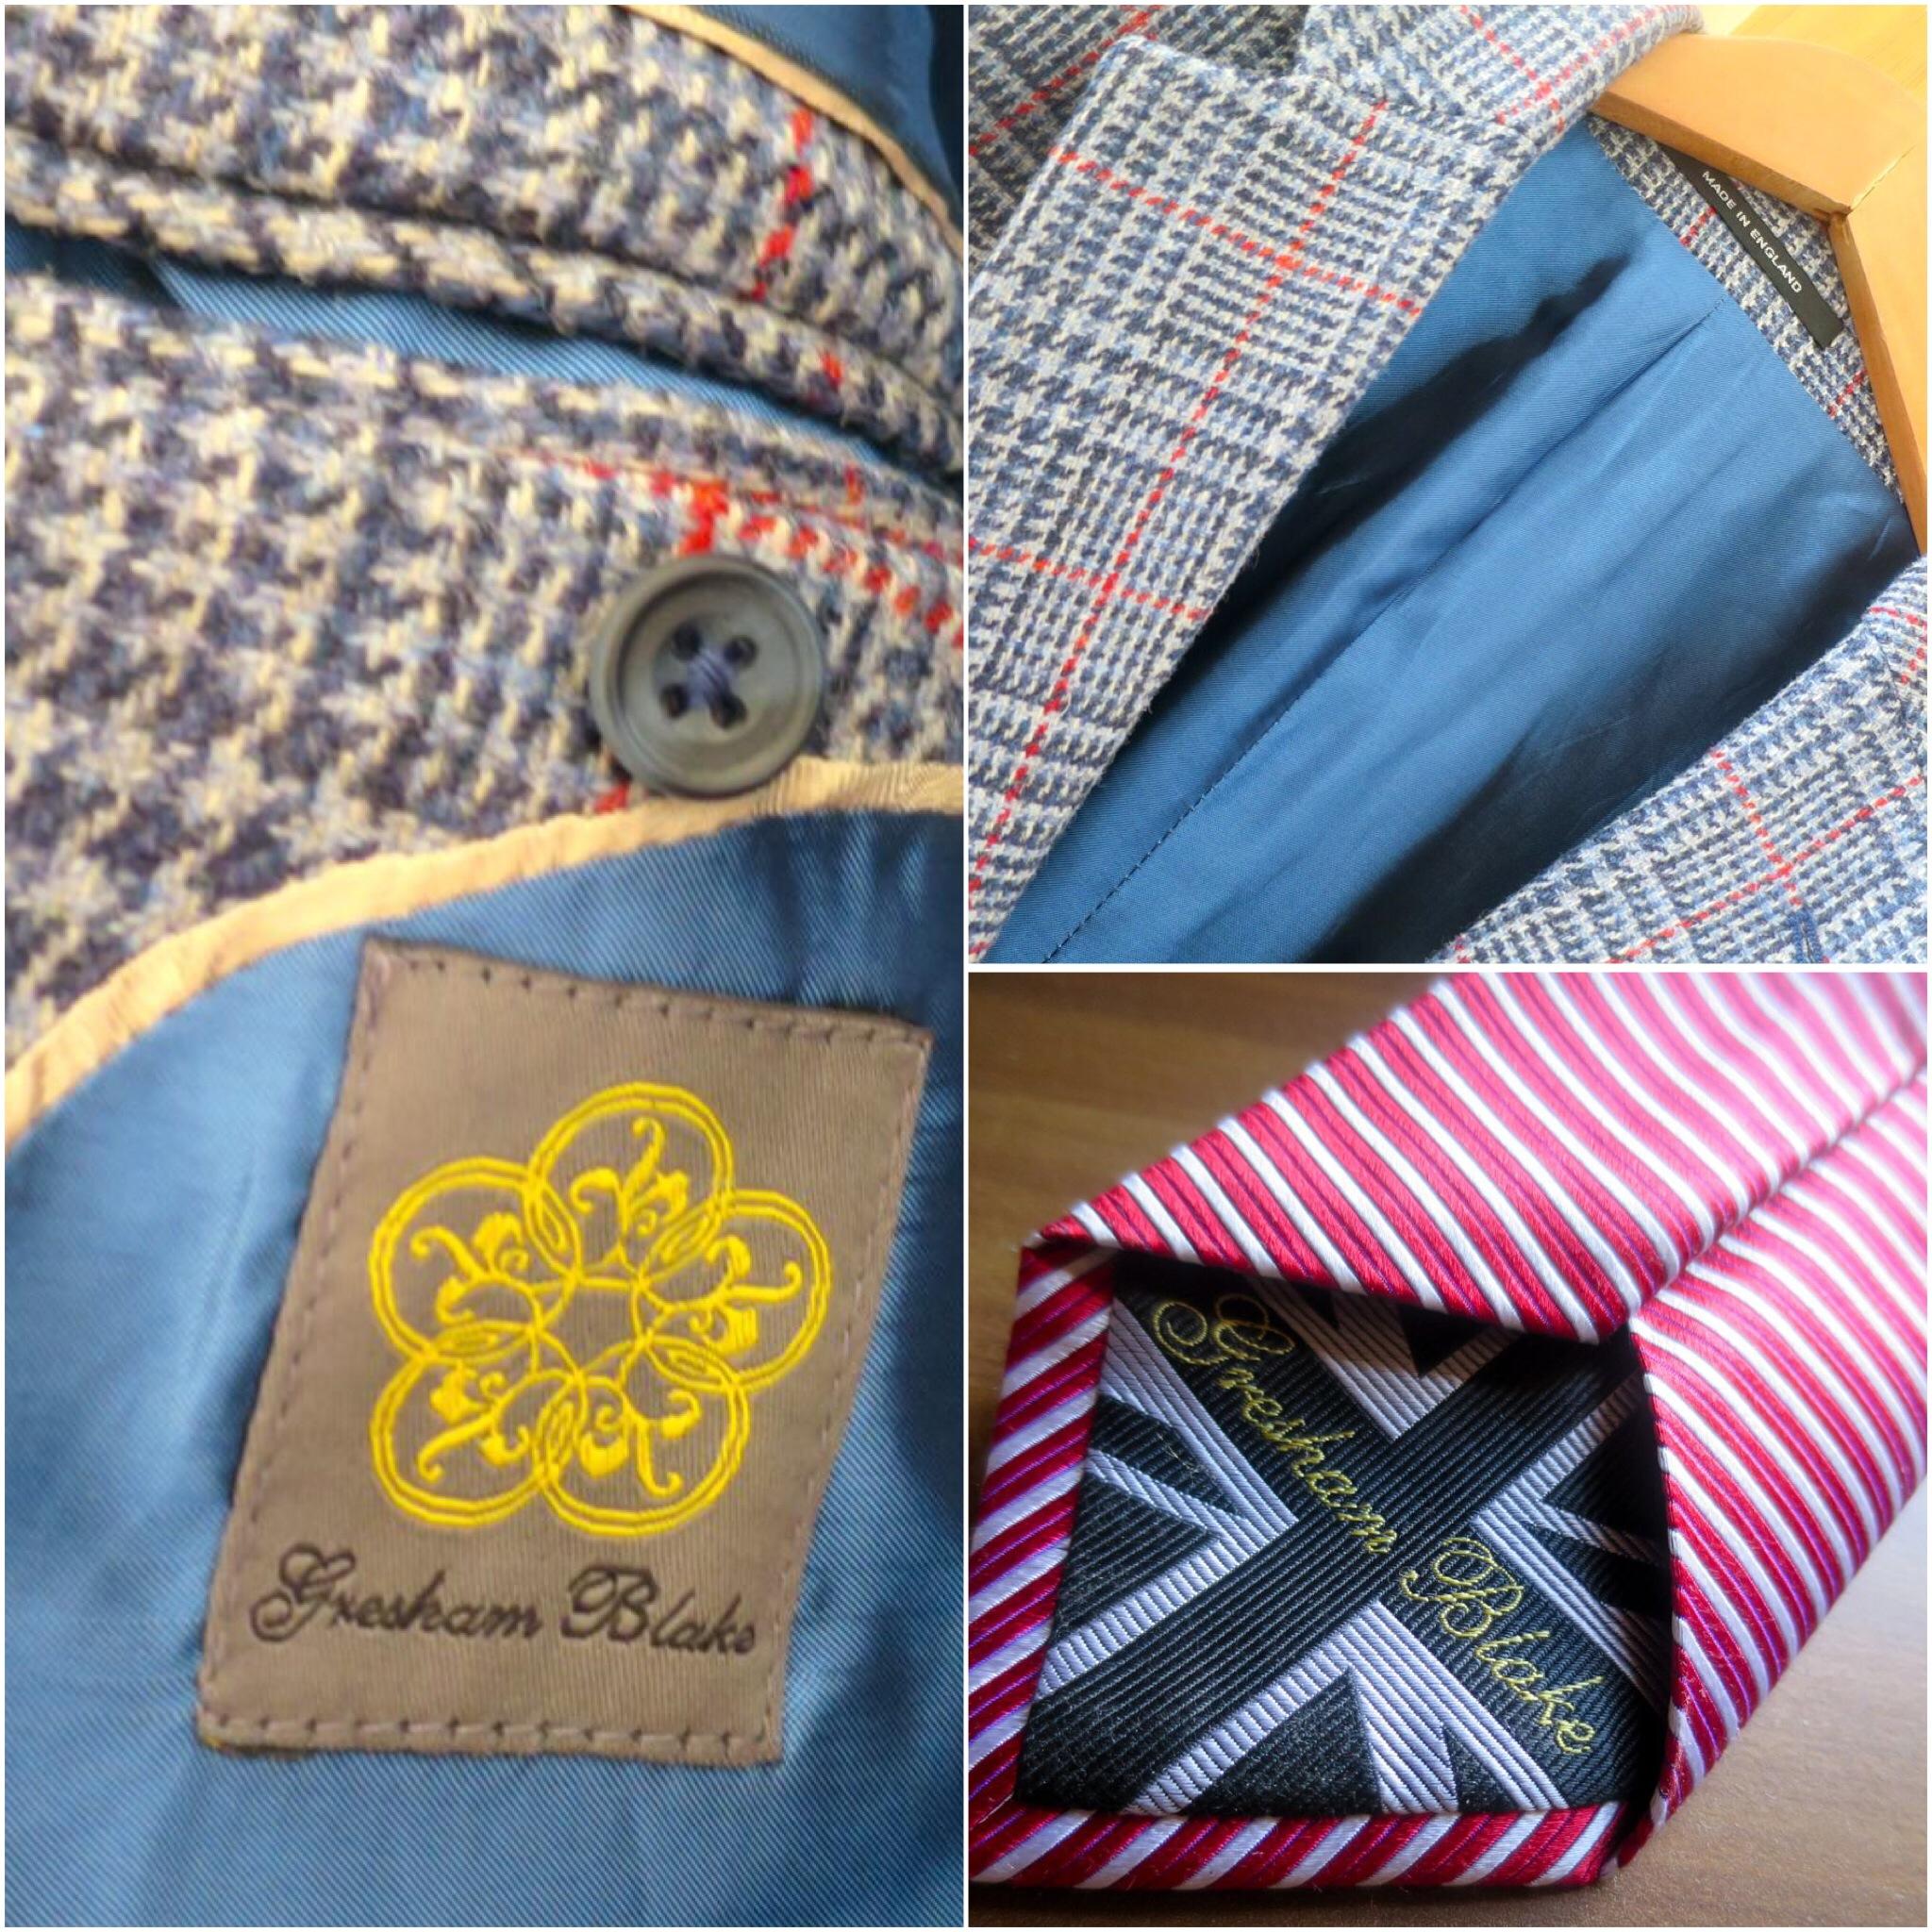 Creative tailoring and tweeds.